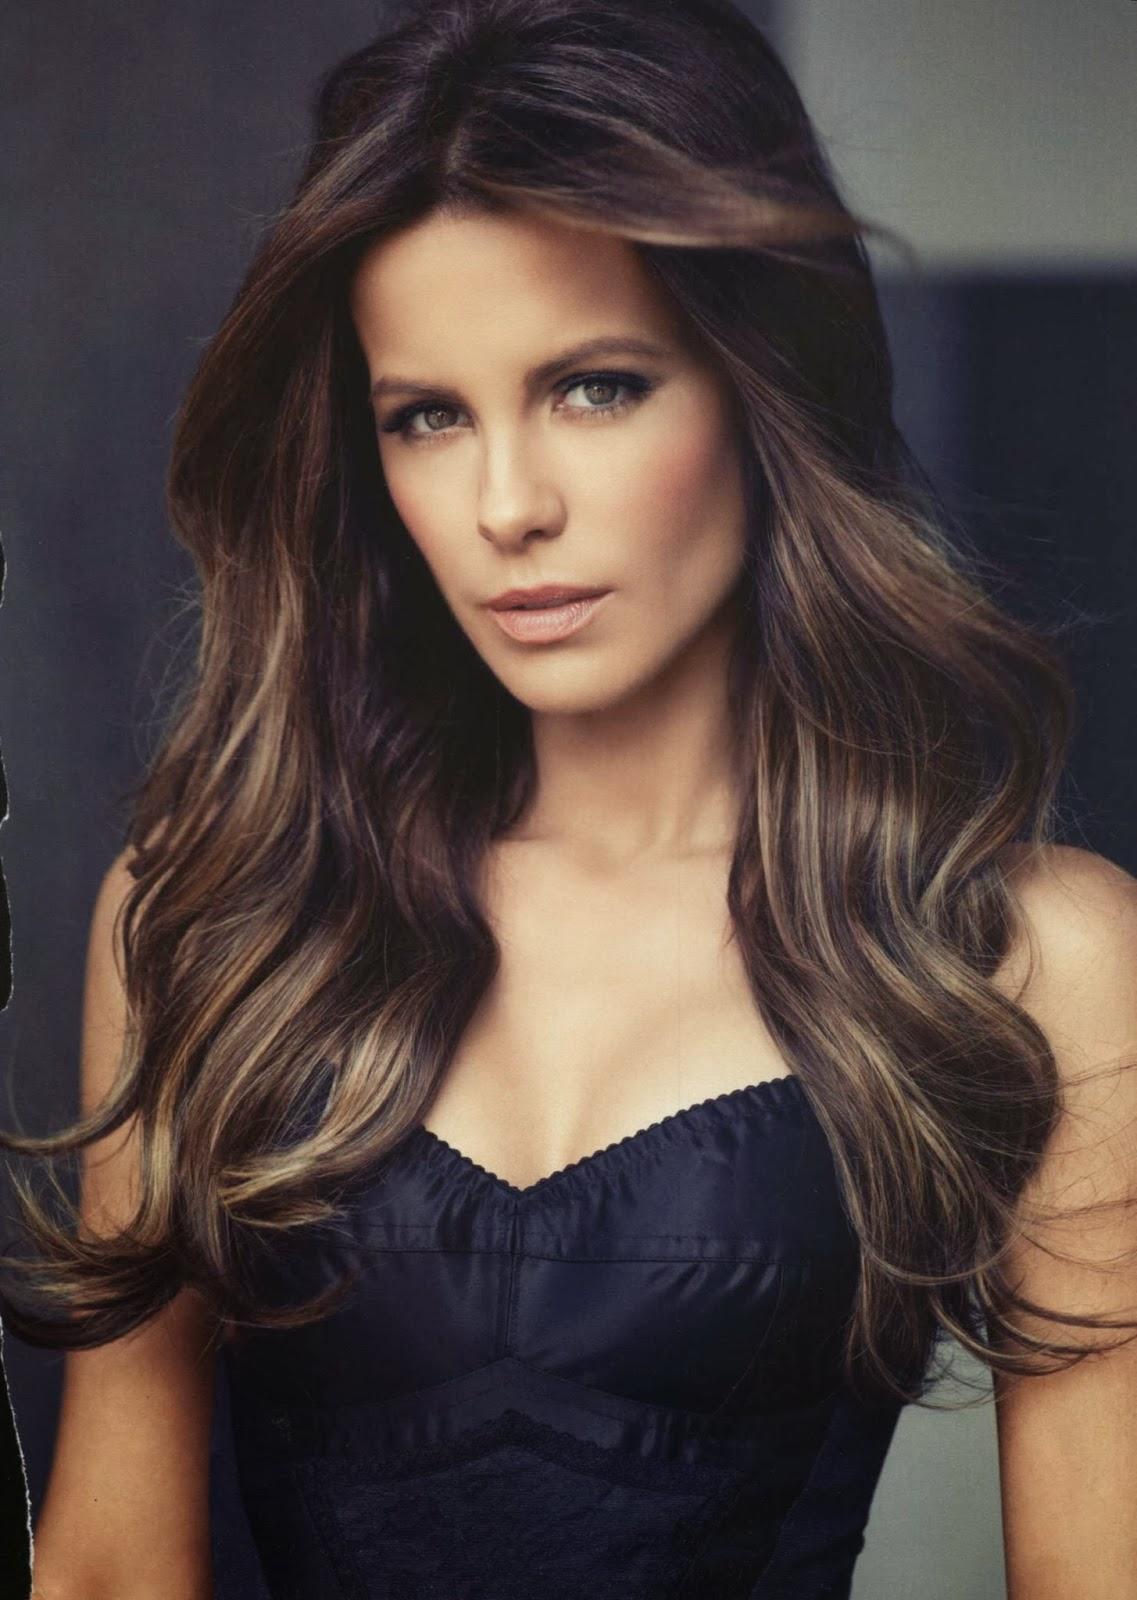 kate beckinsale hot pics/kate beckinsale beautiful pics ... Kate Beckinsale